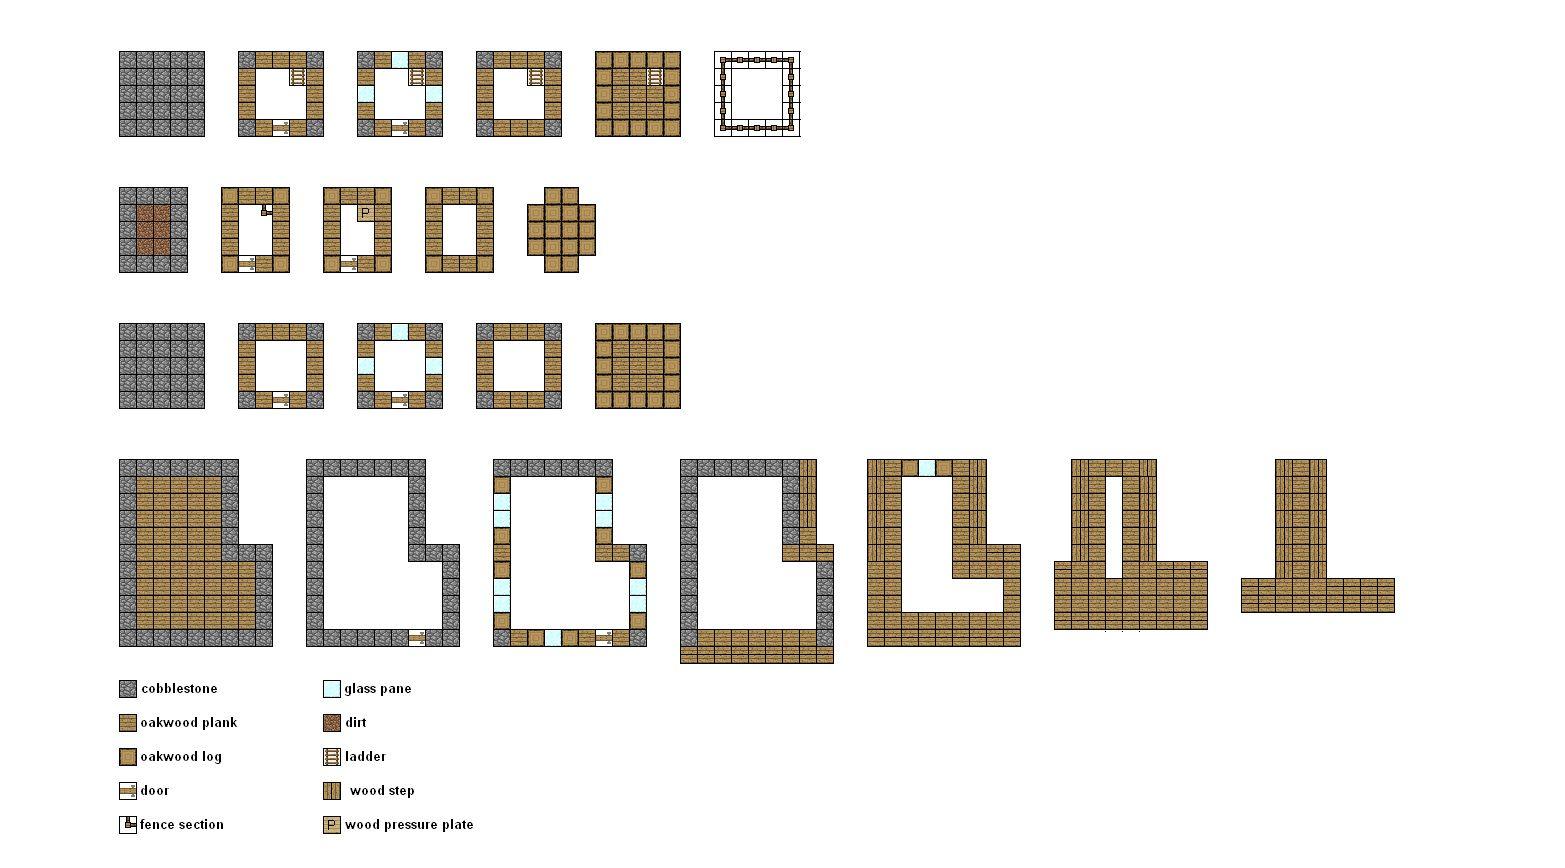 minecraft house blueprints 10 Minecraft houses